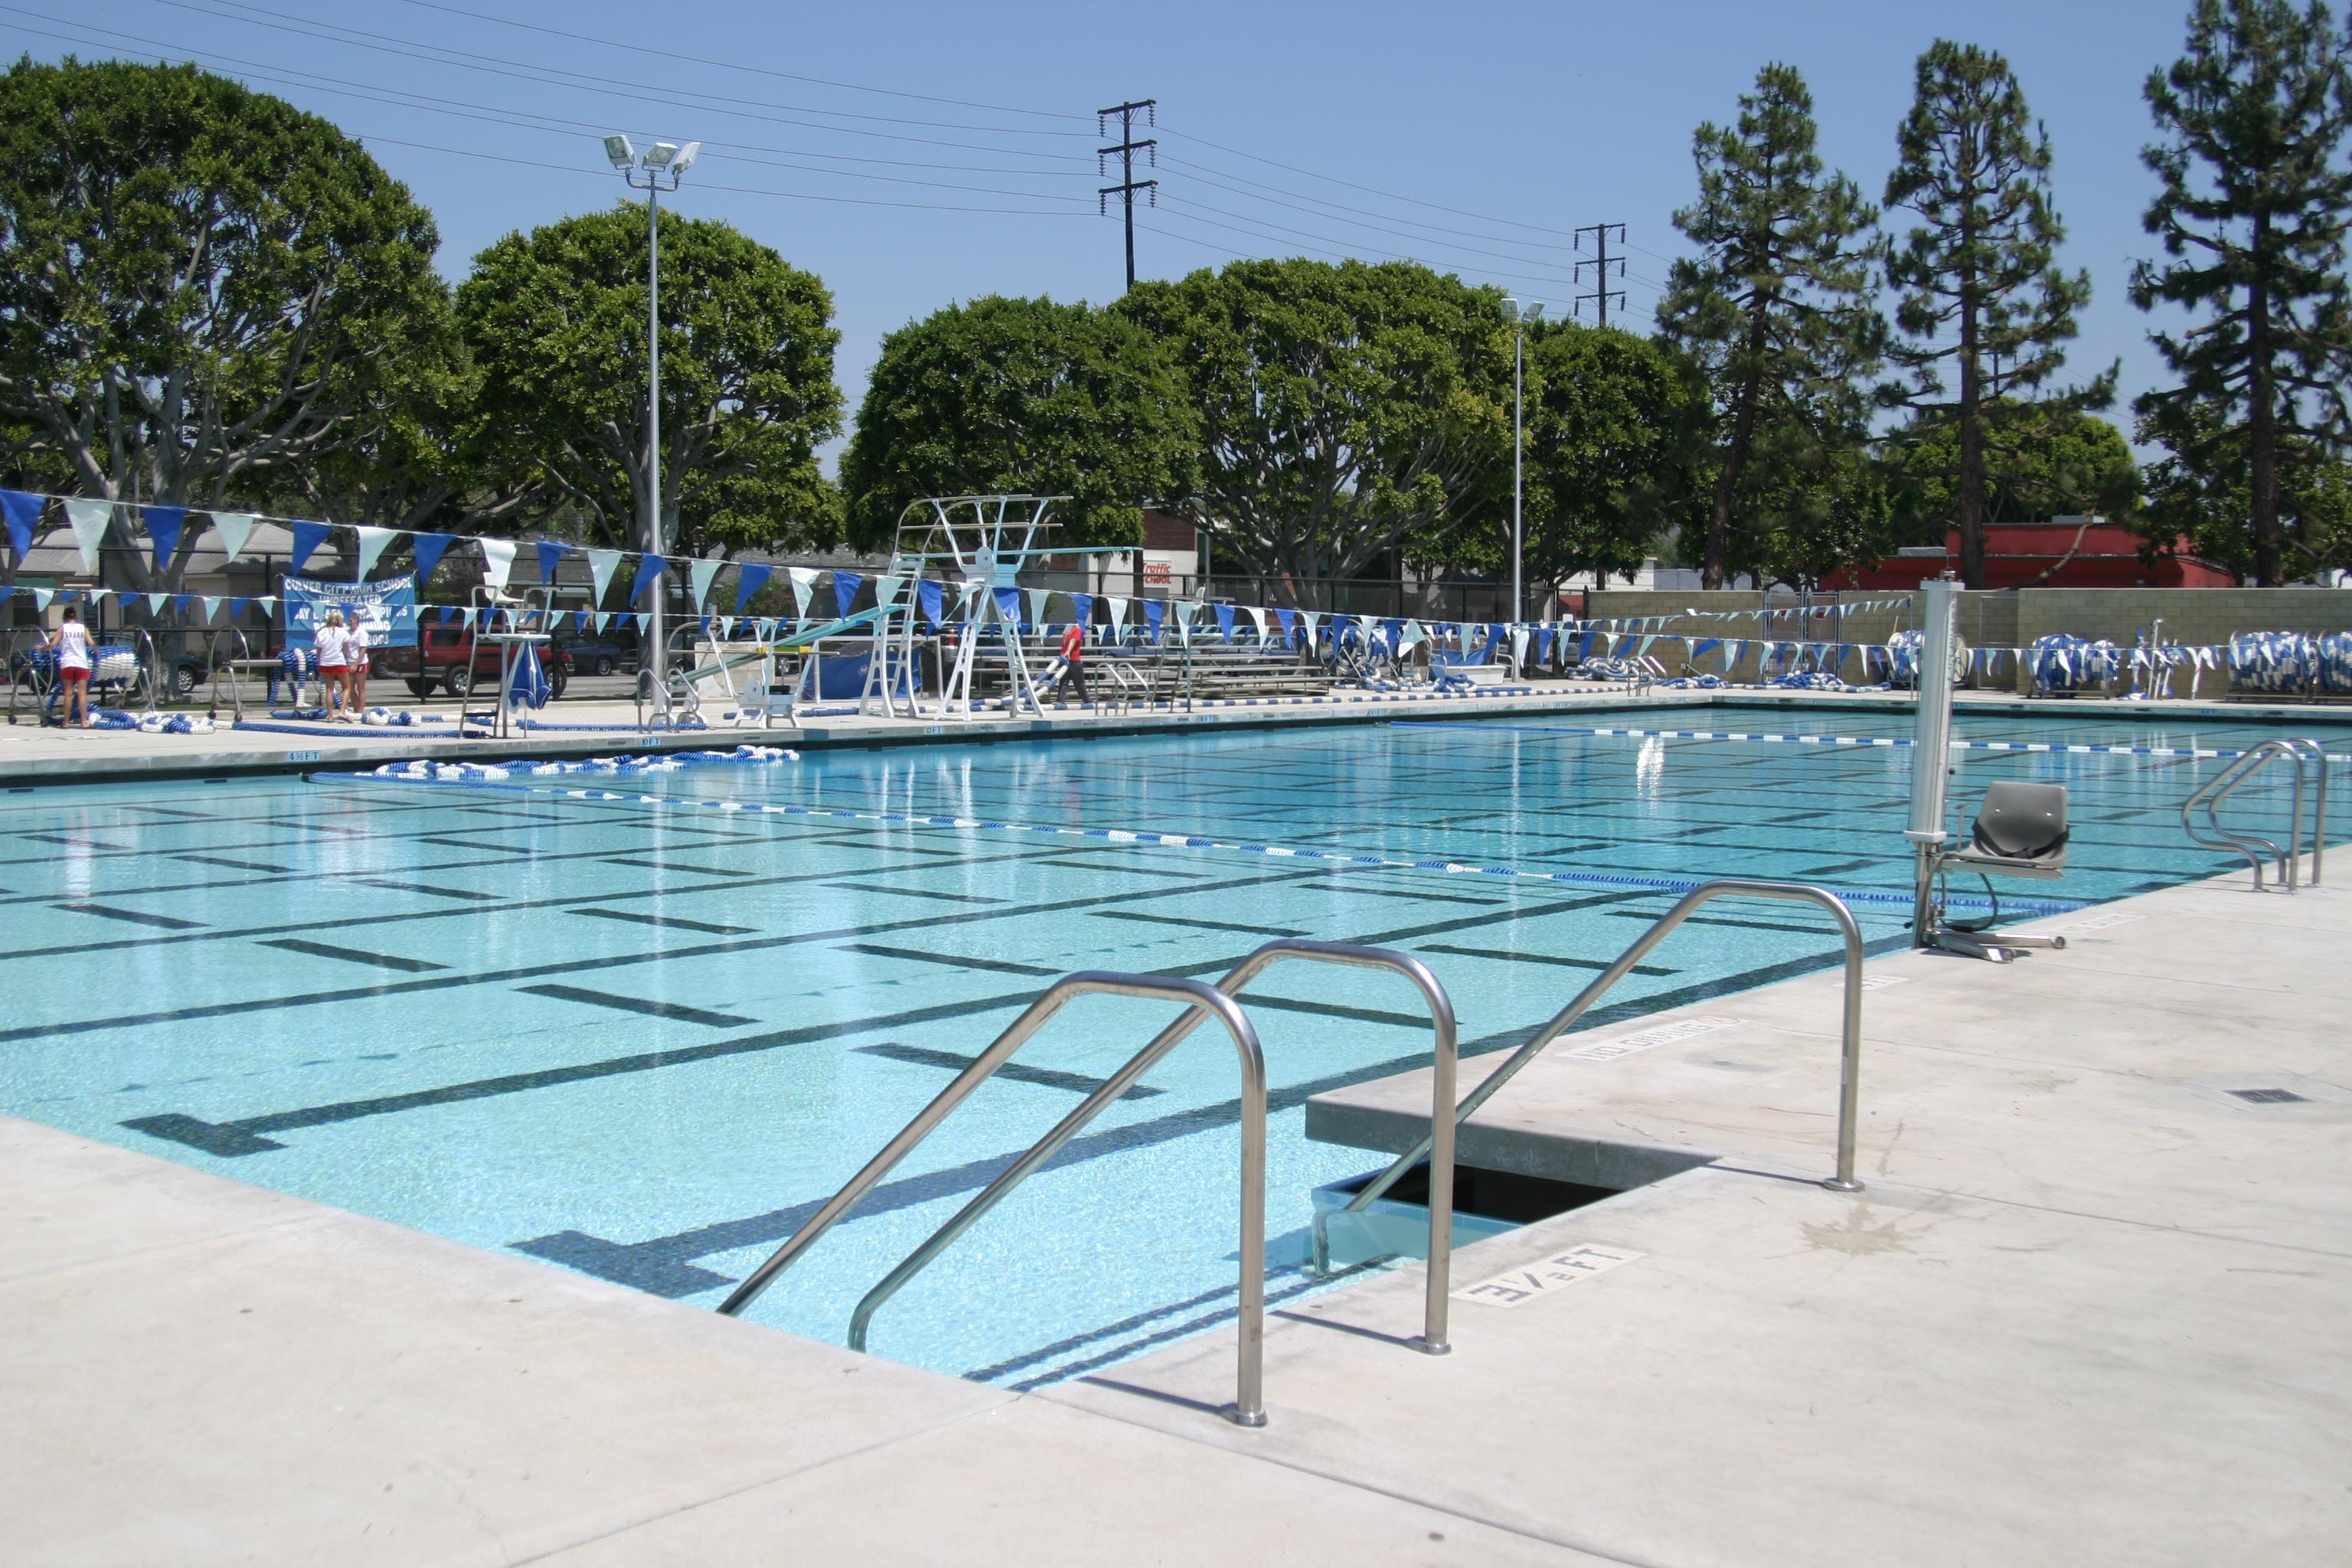 cdfdbd7784f 2018 Los Angeles County Junior Lifeguard Swim Test  Culver City Plunge